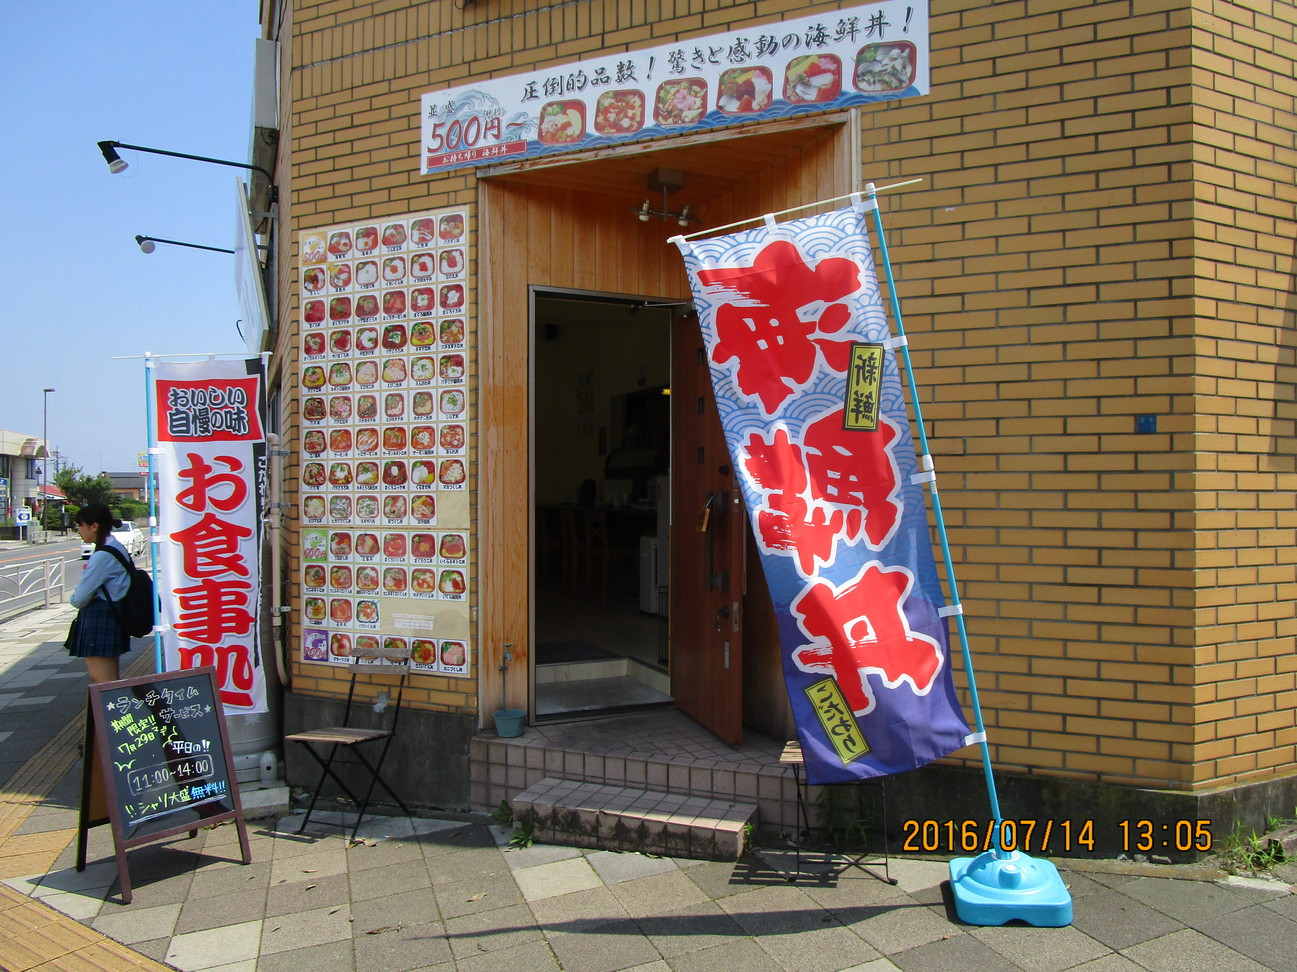 海の華 丼丸 渋沢店